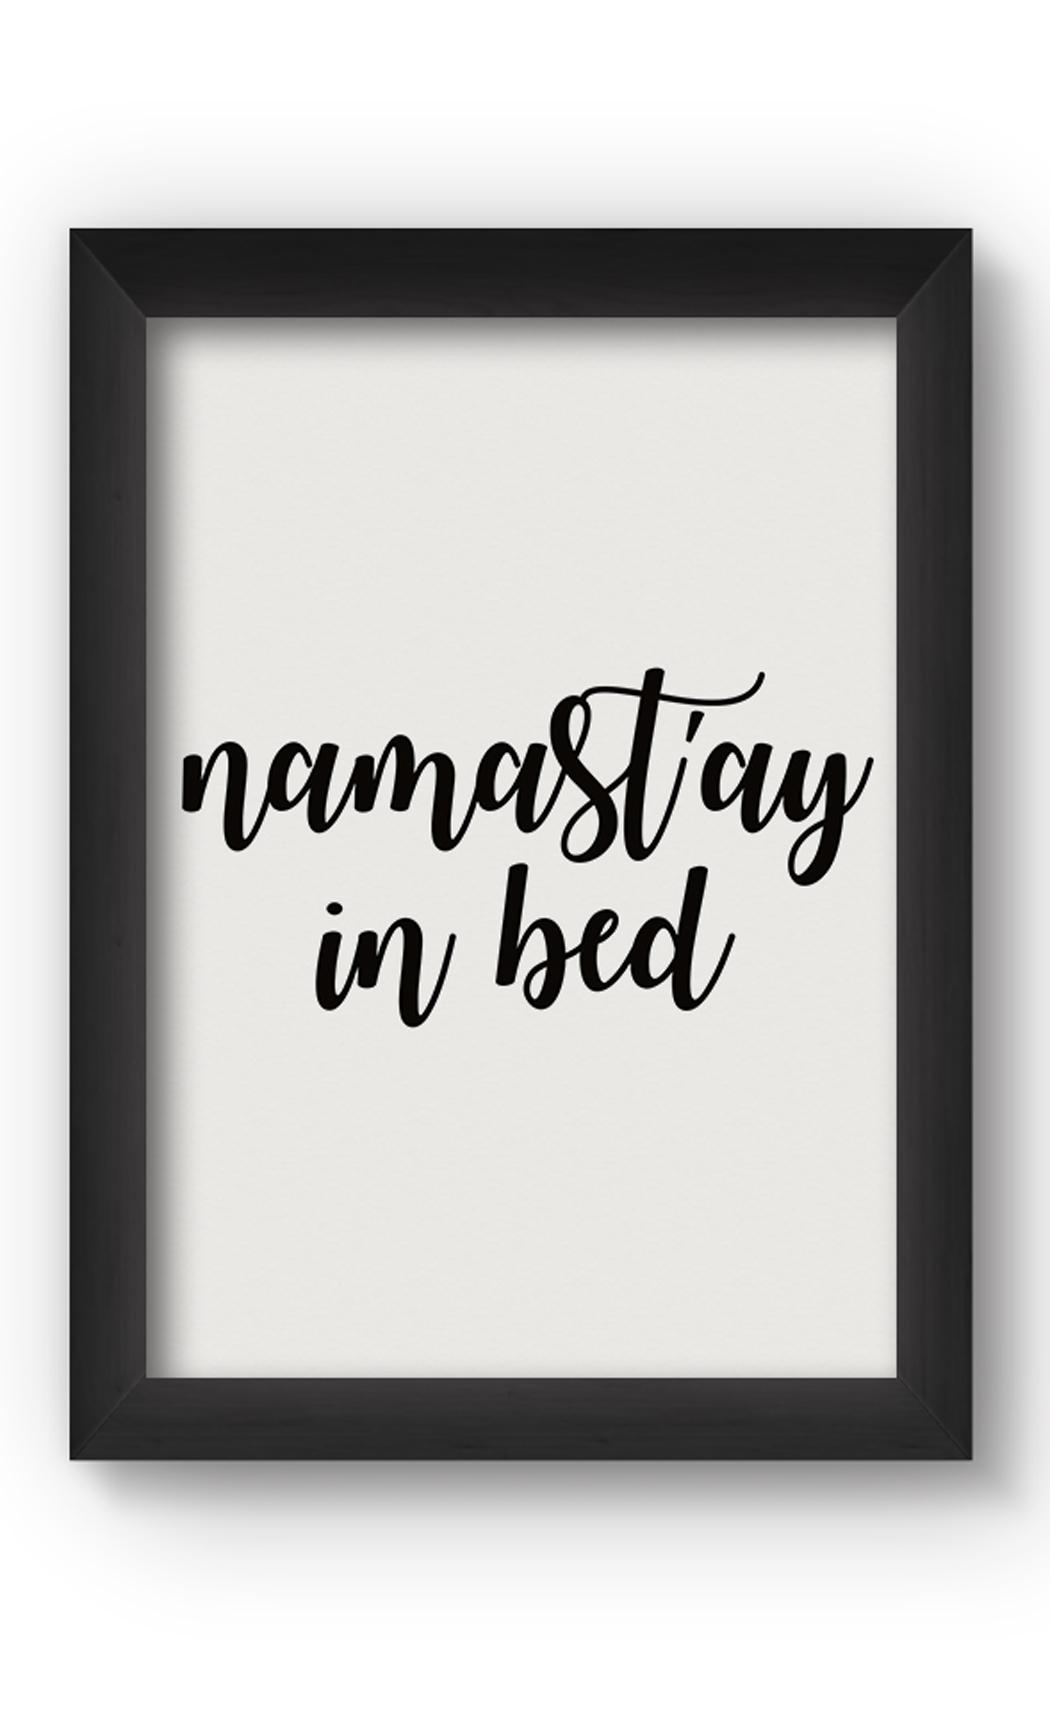 Black & White NAMASTAY Poster. Buy Online.